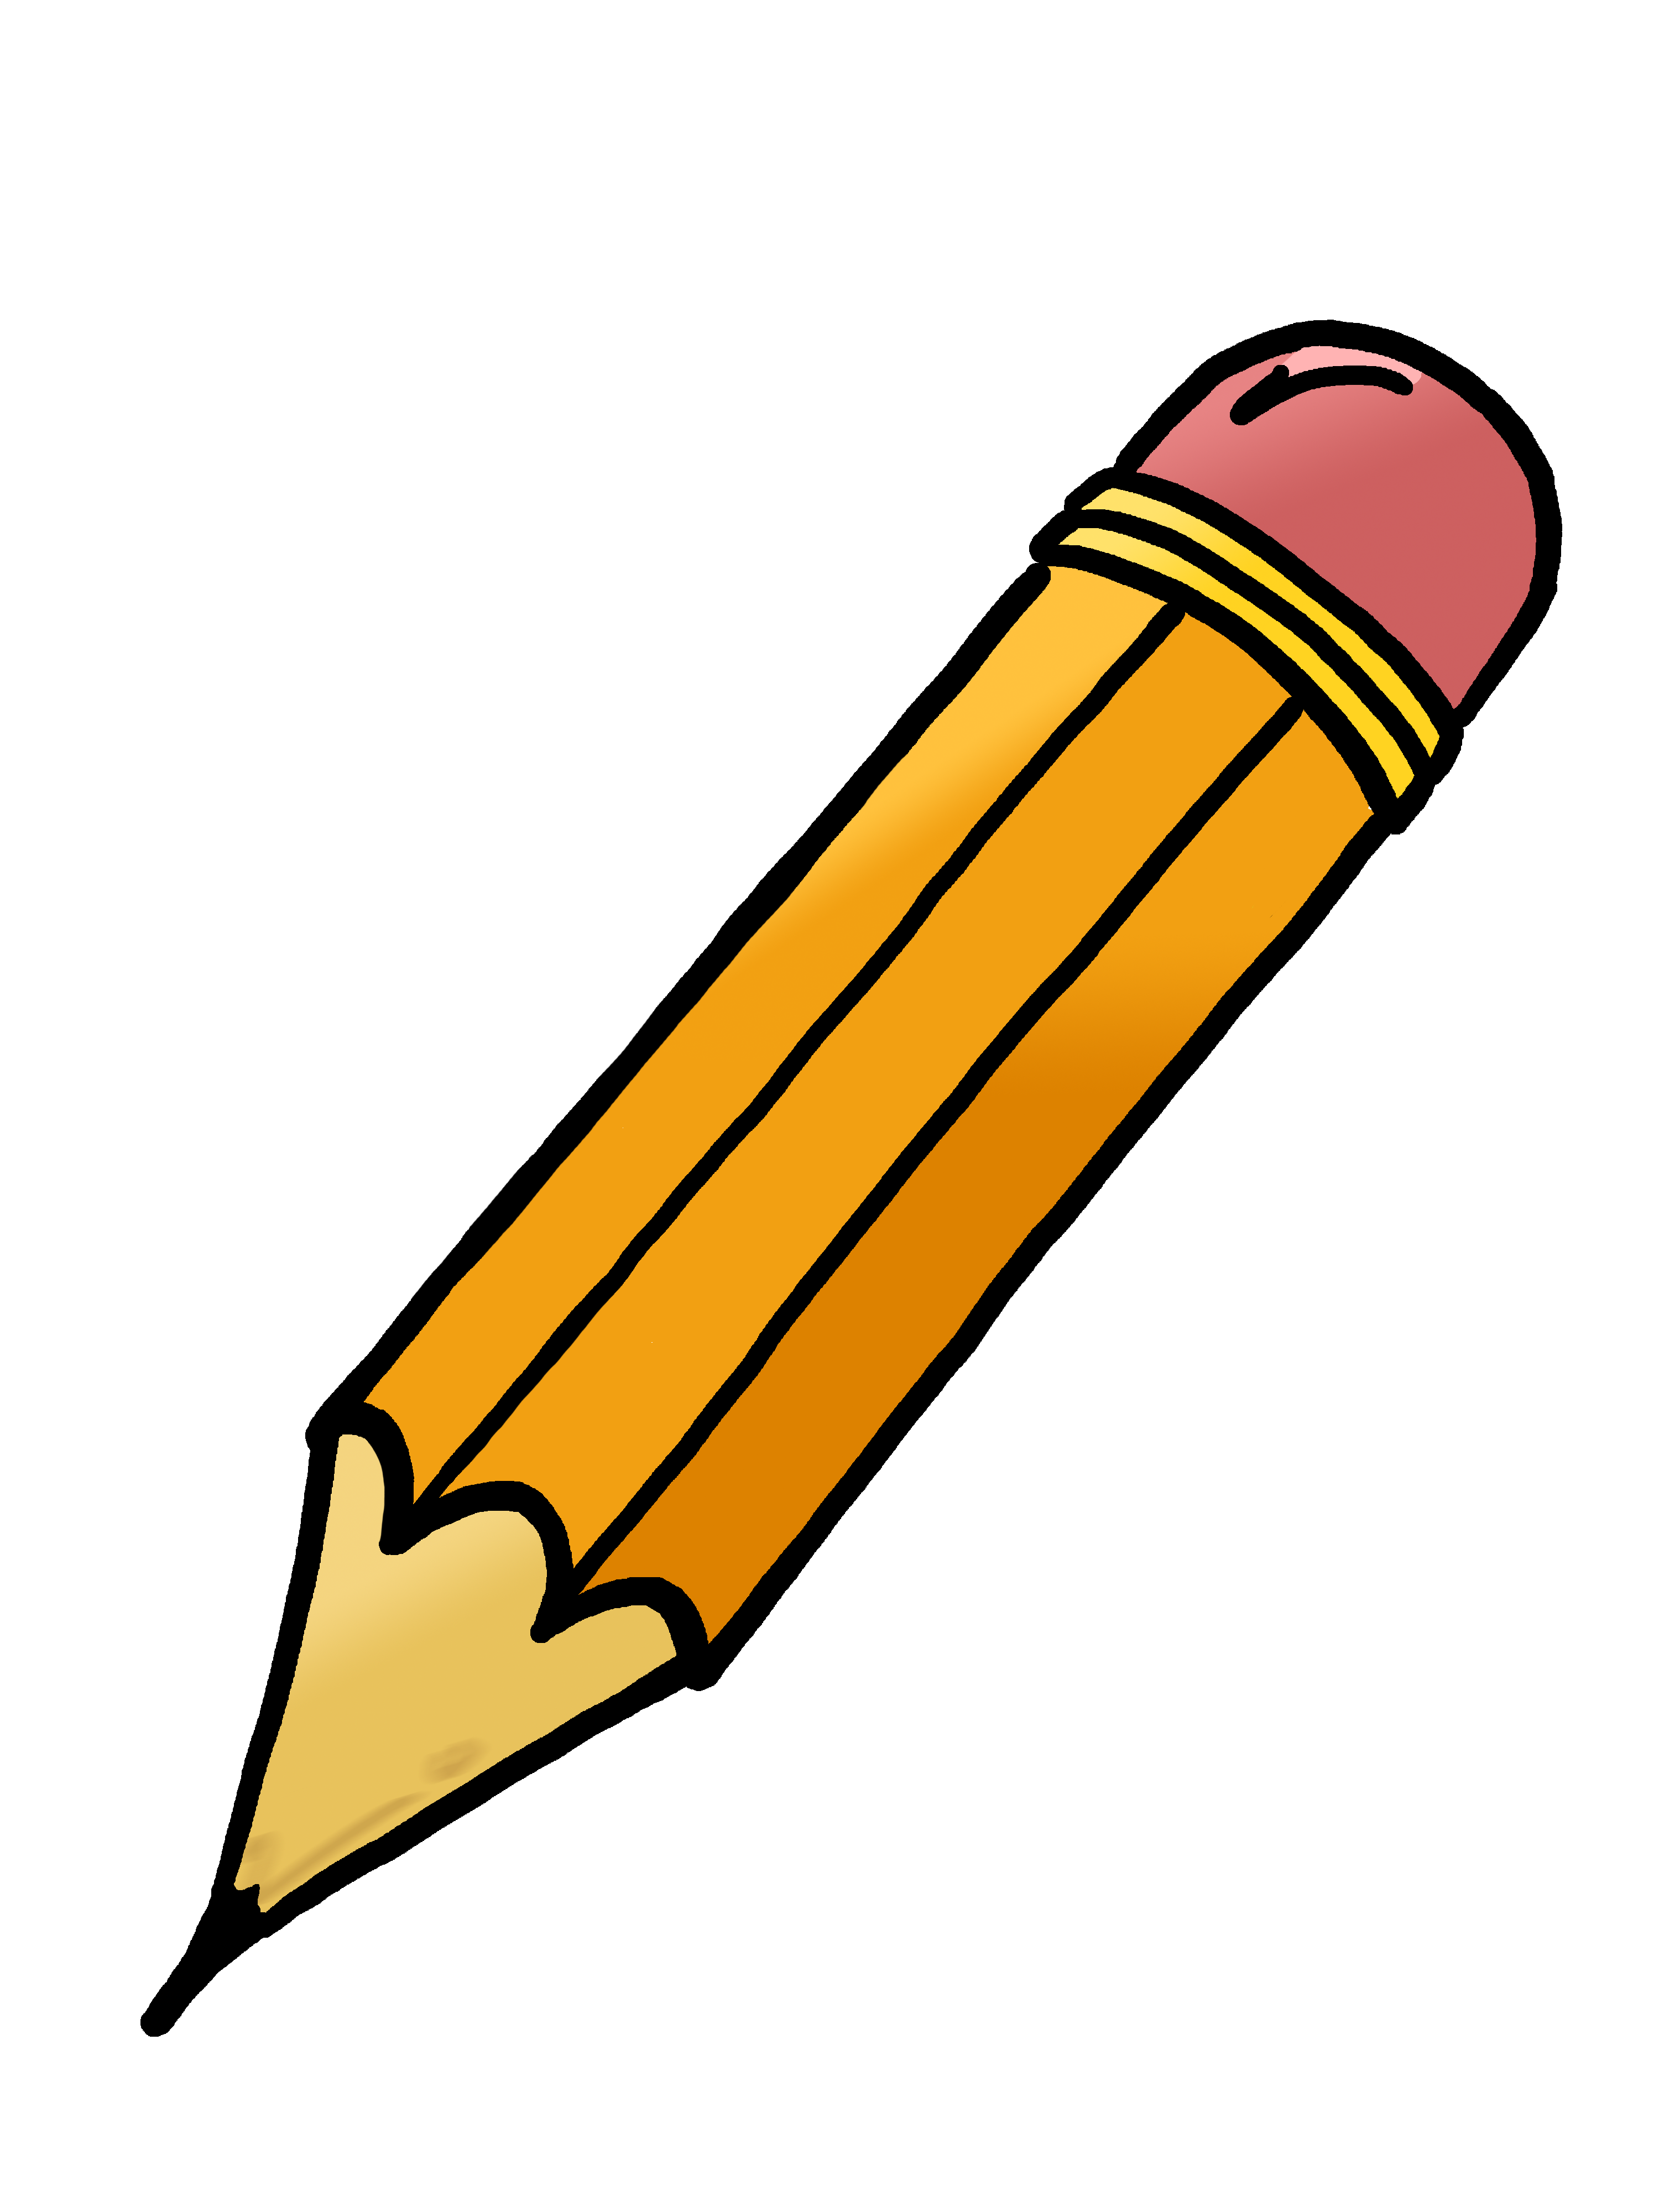 Pencil clipart logo. Basic clip art panda